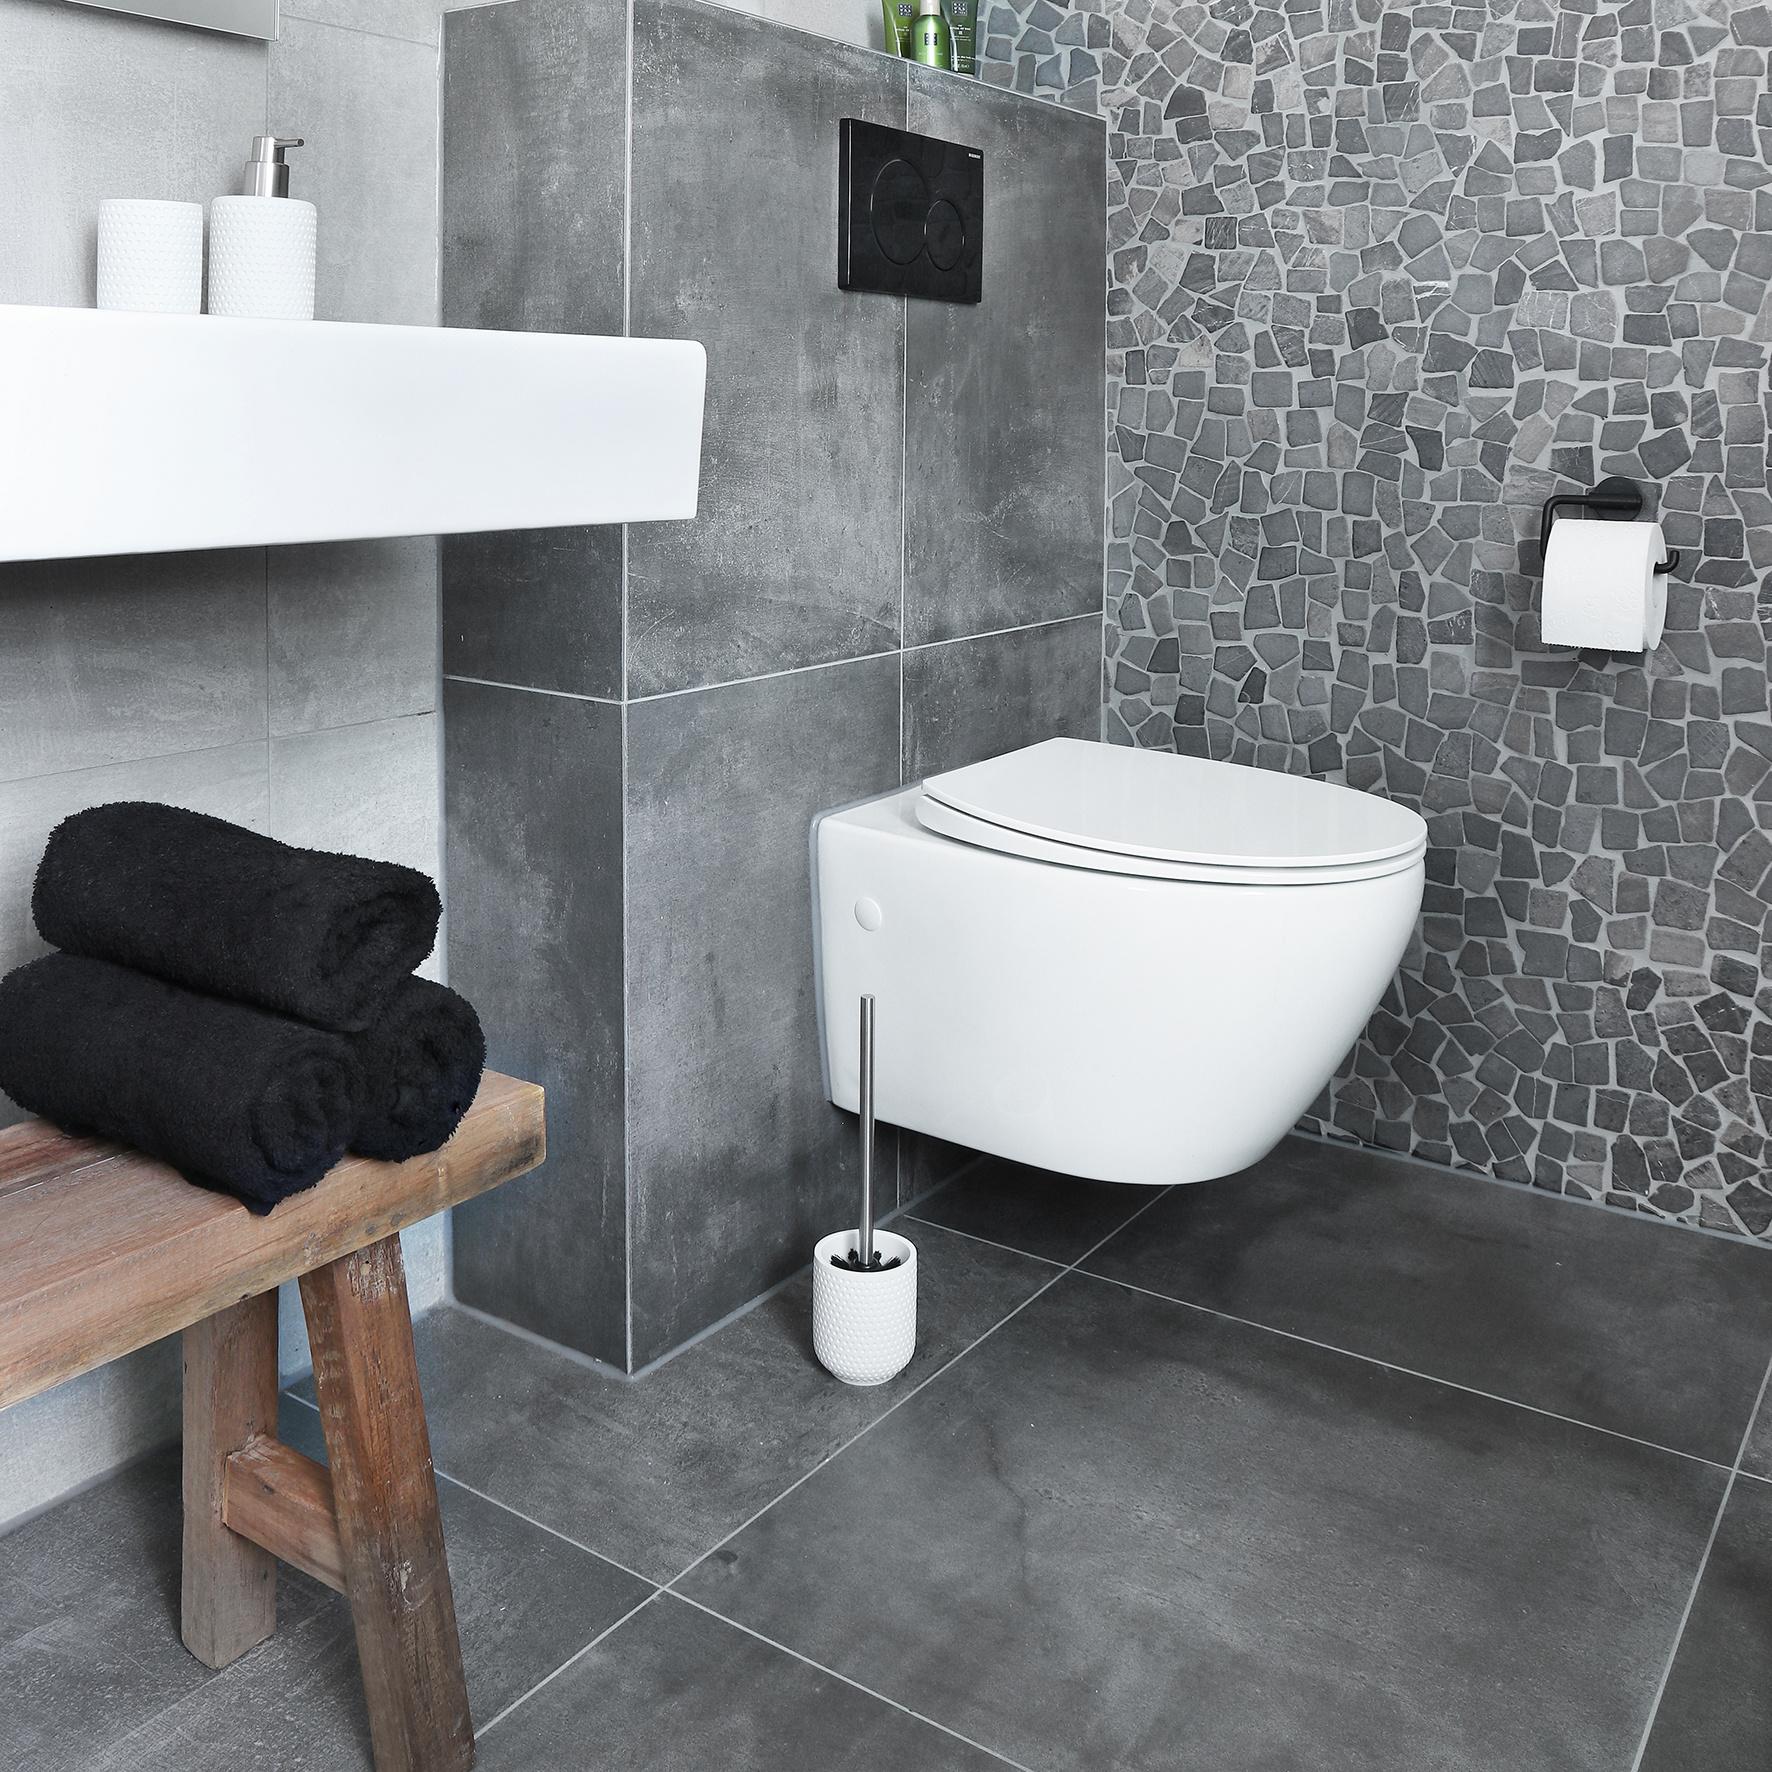 Accessoires Set Toilet Badkamer Club Wit-5